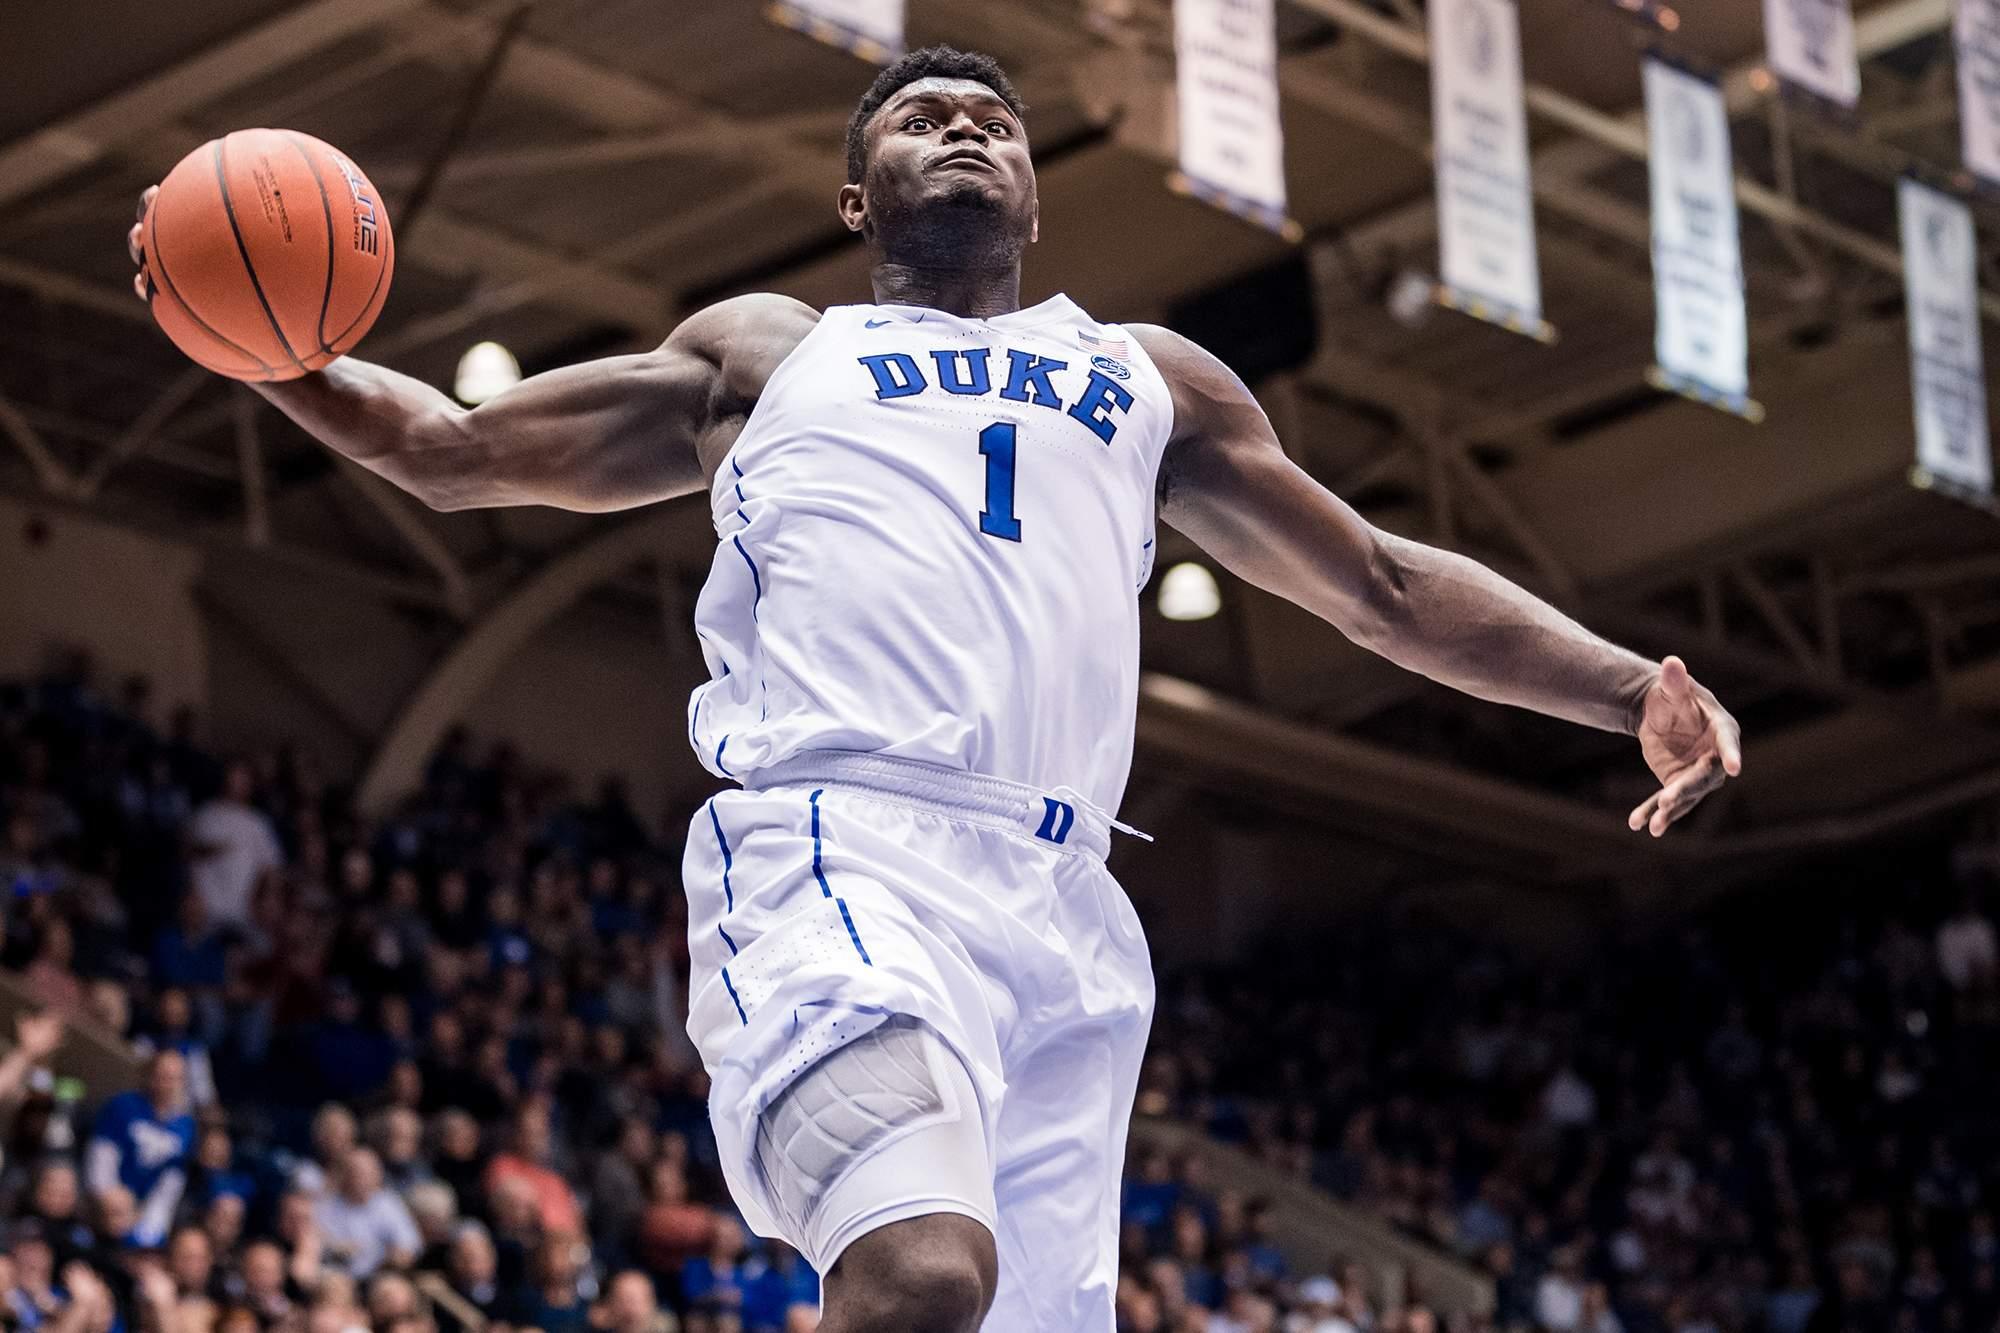 Zion Williamson scoring a basket for Duke University